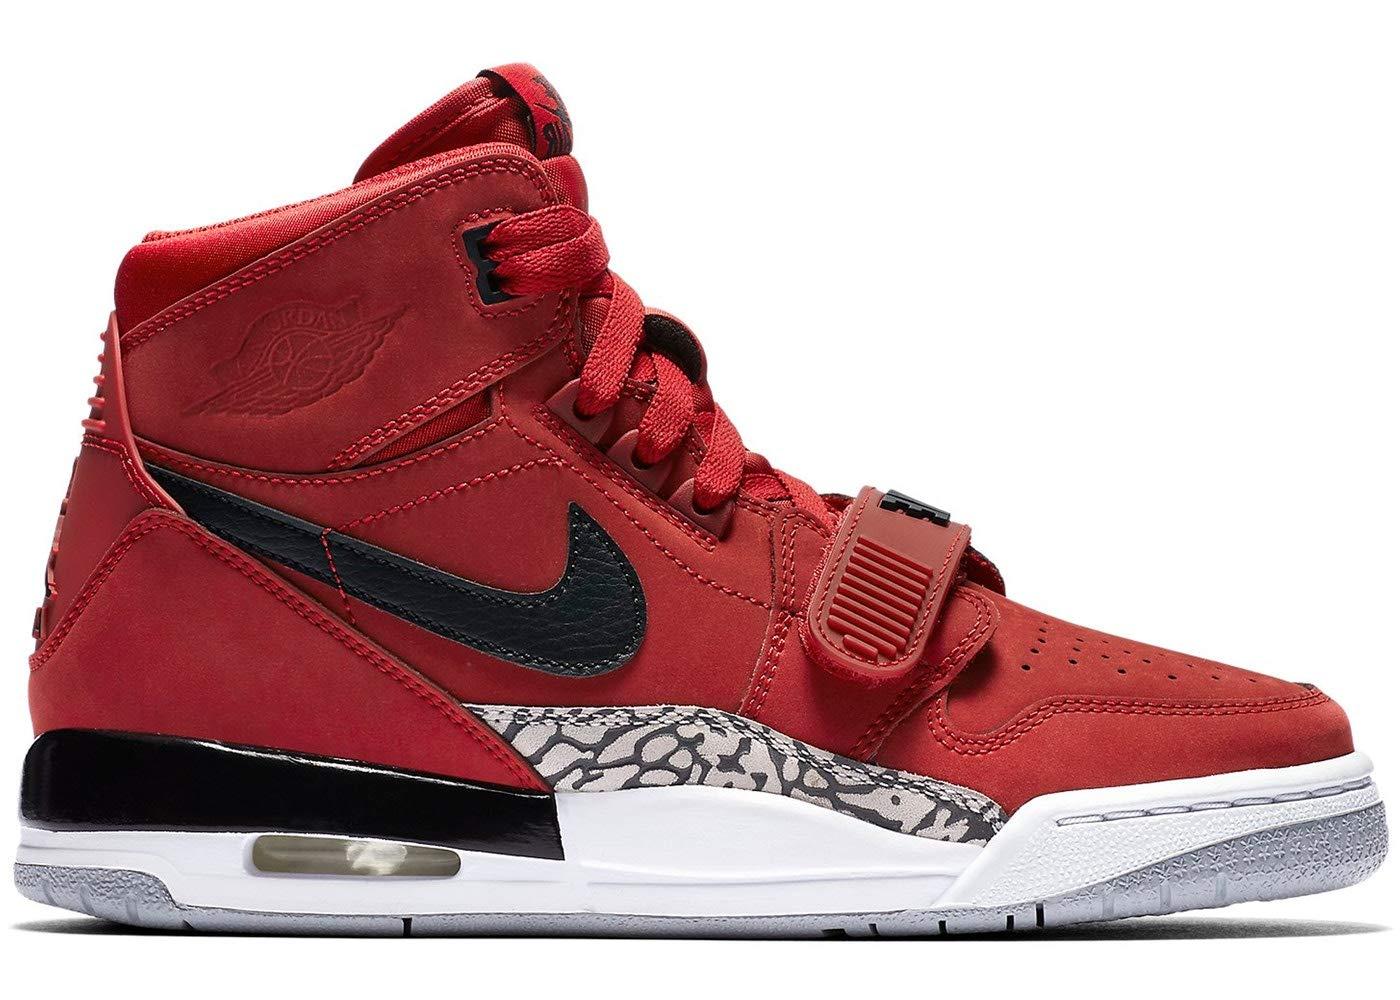 Nike Jordan Kids Air Jordan Legacy 312 (GS) Varsity Red/Black/Wht Basketball Shoe 7 Kids US